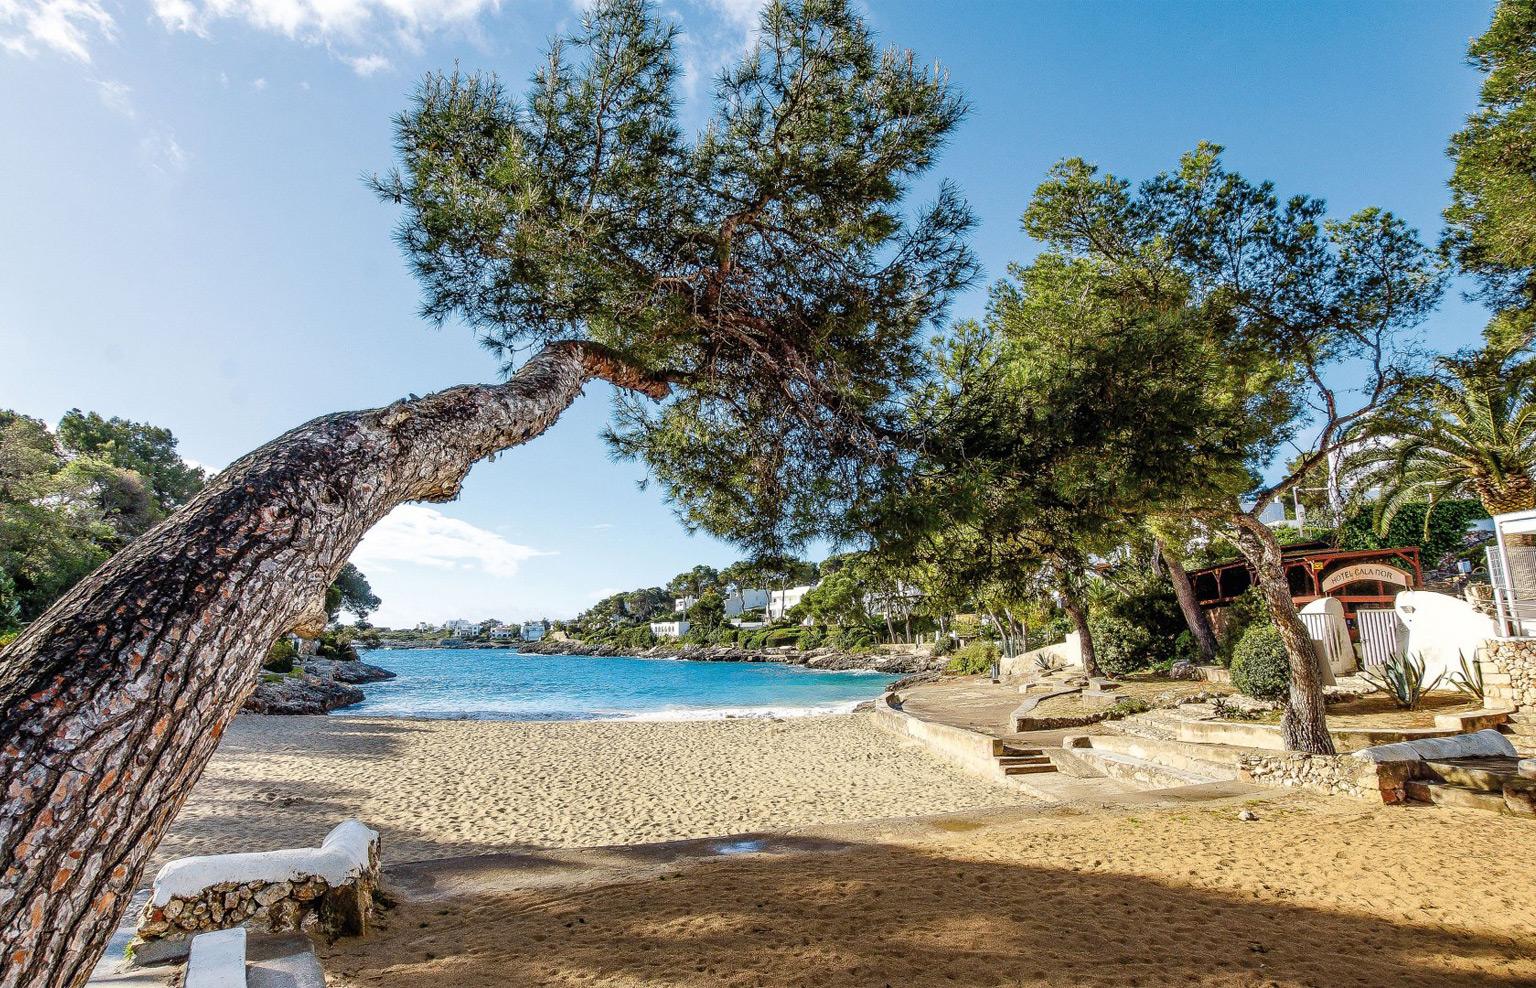 Mallorcaurlaub Cala d'Or